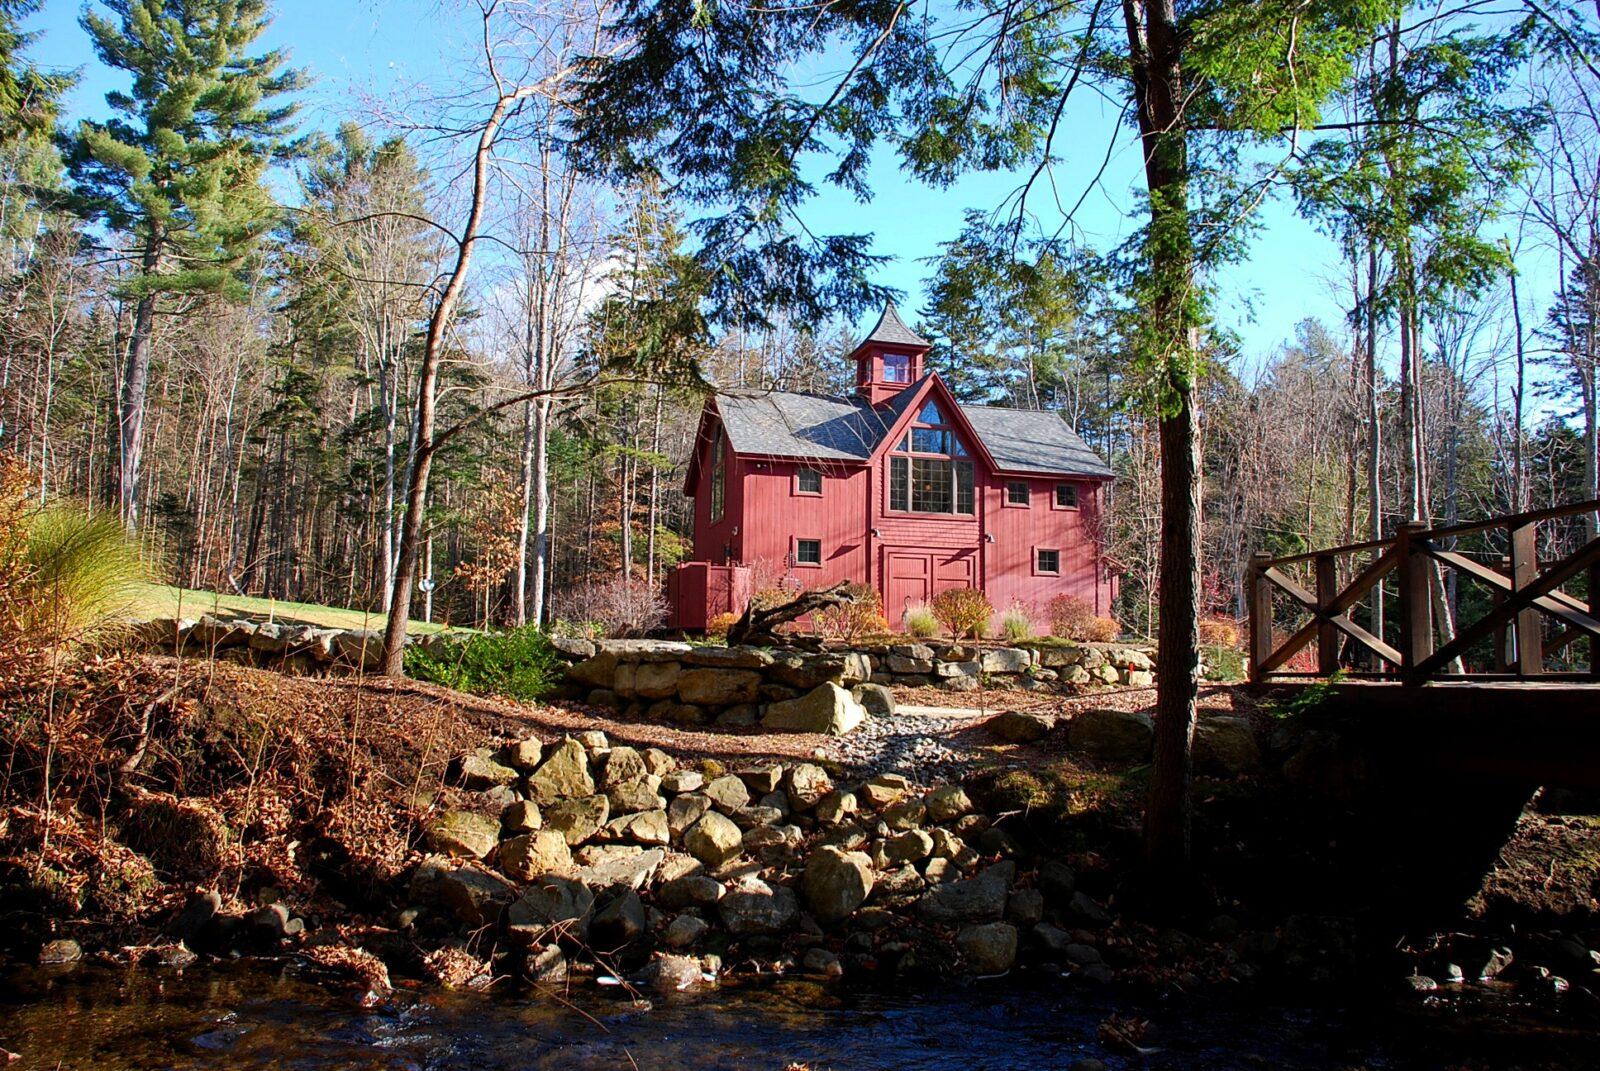 Small Post And Beam Homes Yankee Barn Homes - Small post and beam homes